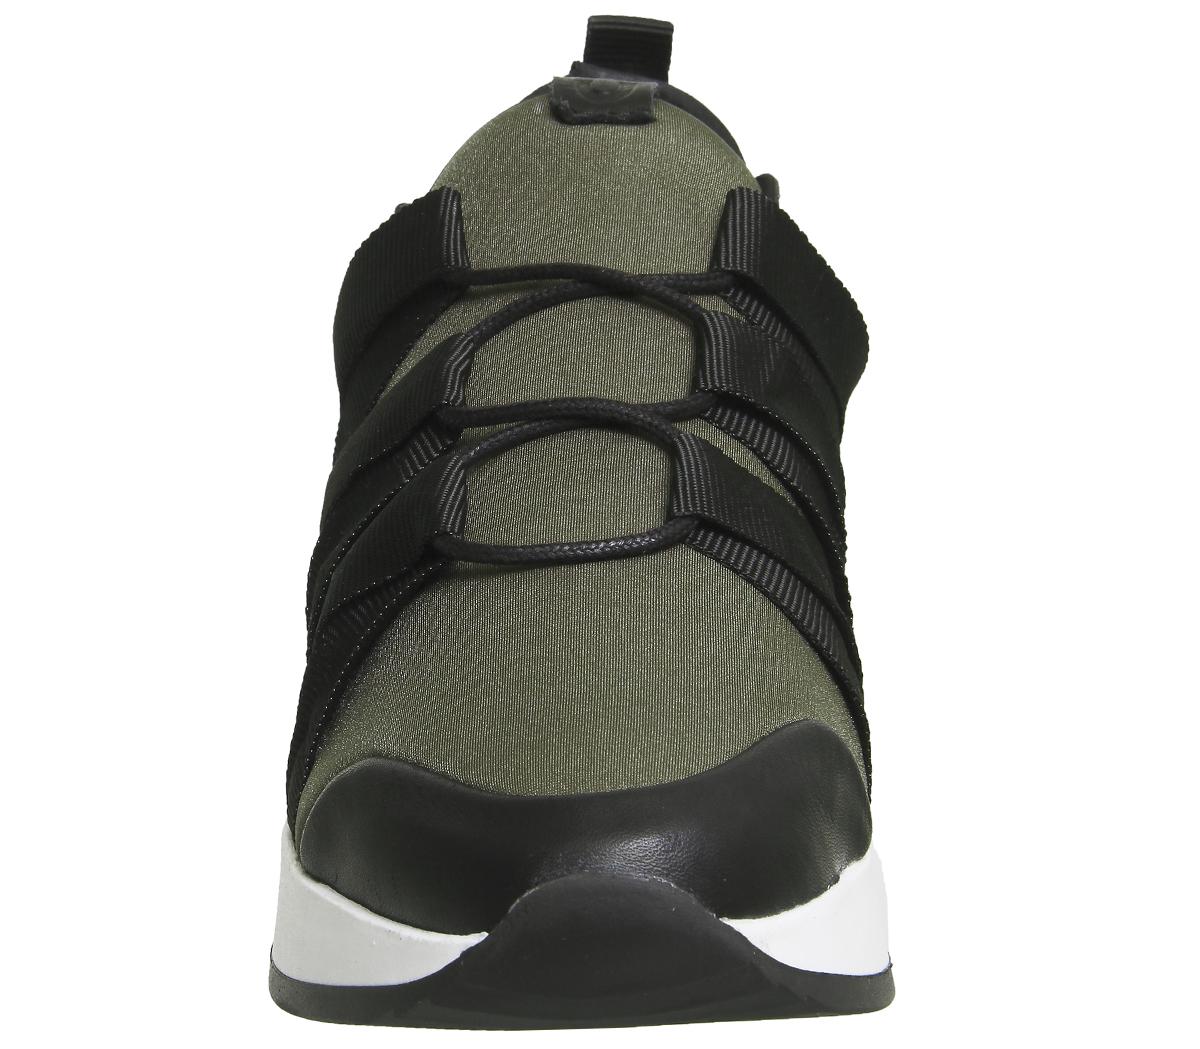 Damenschuhe Oki BLACK Kutsu Rikuto lace Up Runner BLACK Oki KHAKI Trainers Schuhes f26ca2